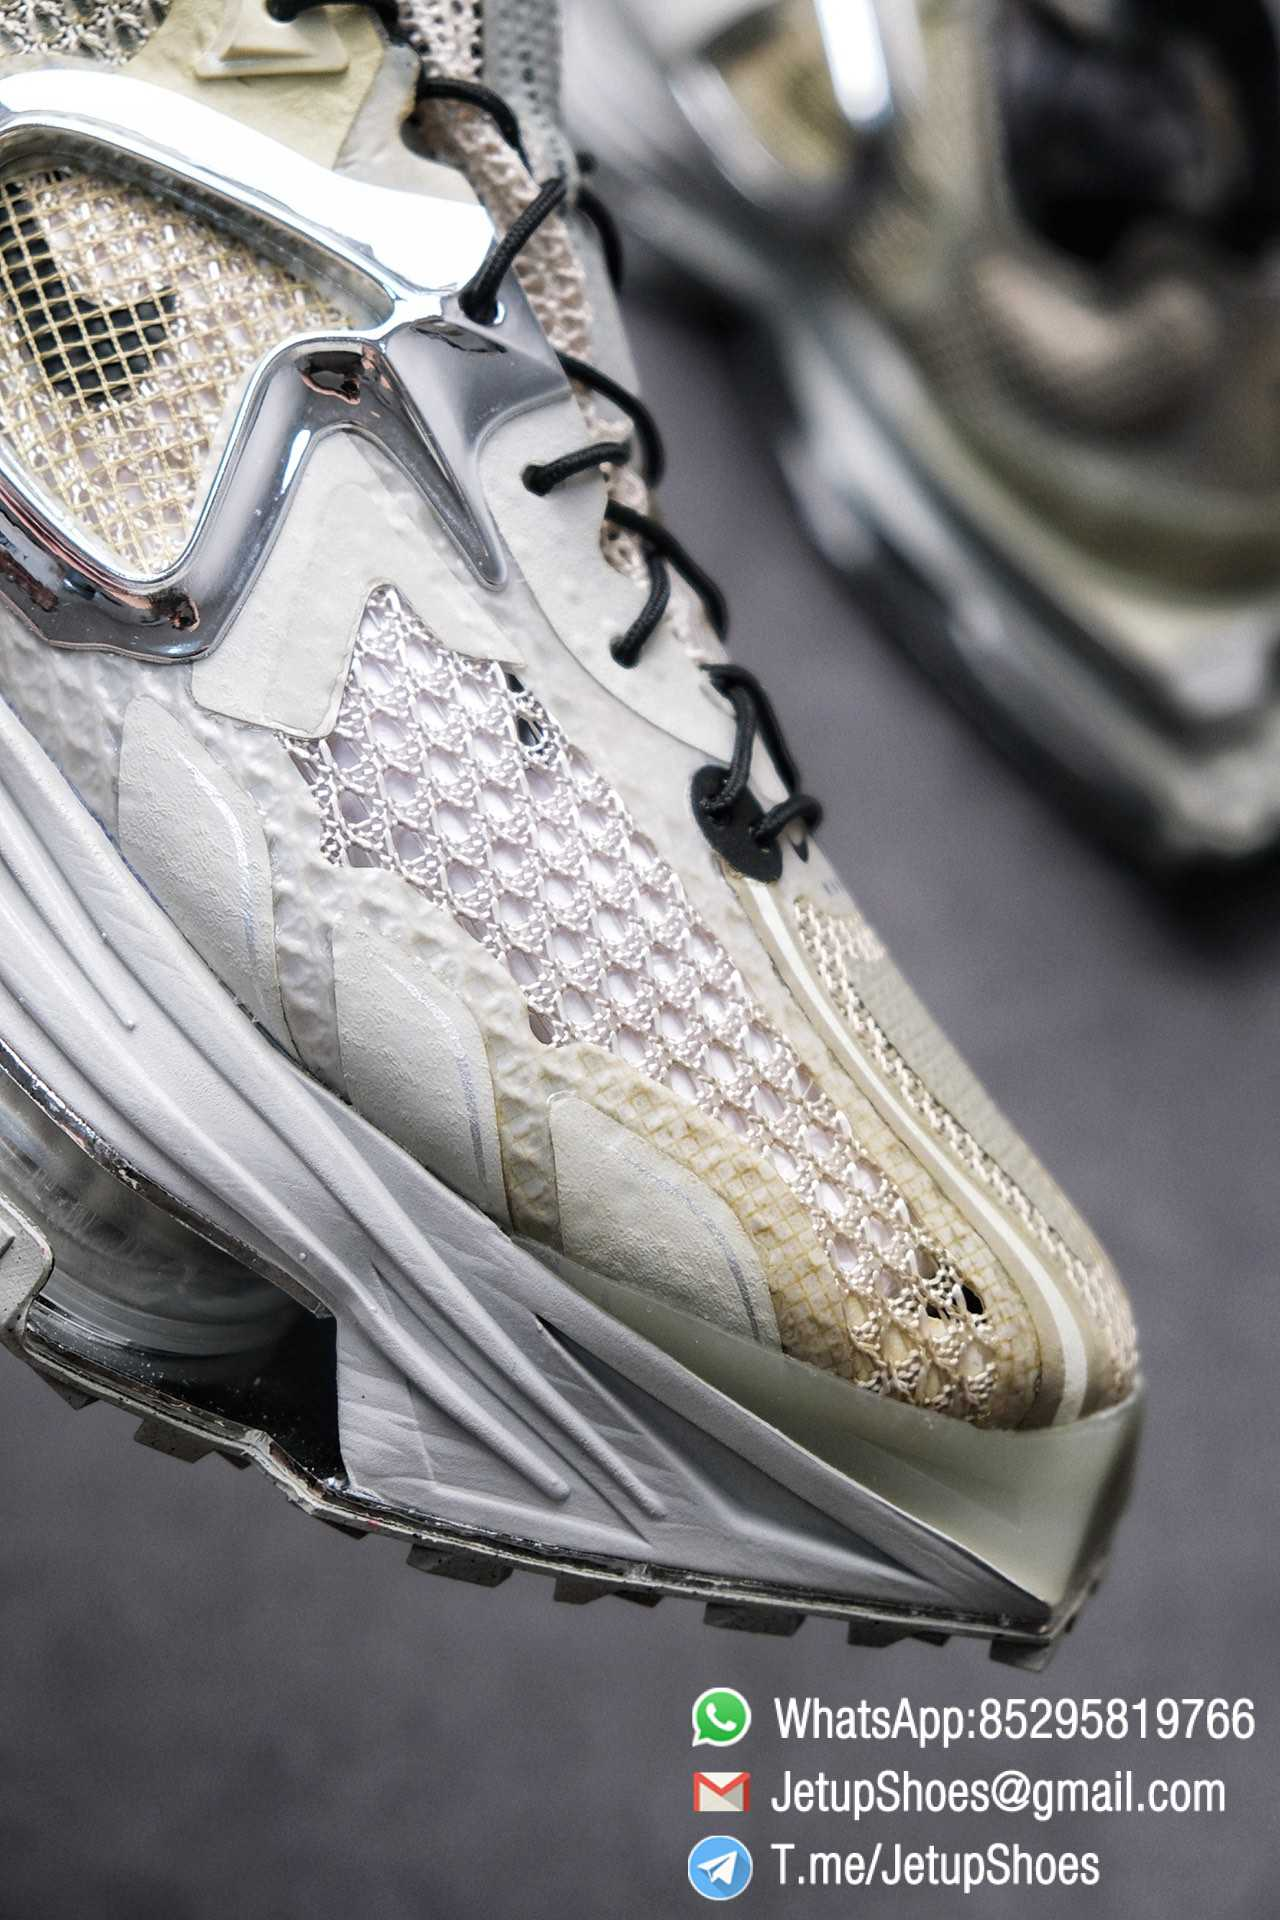 Best Replica Sneakers Matthew M Williams x Nike Zoom 004 Stone CU0676 200 Top Sneakers 02